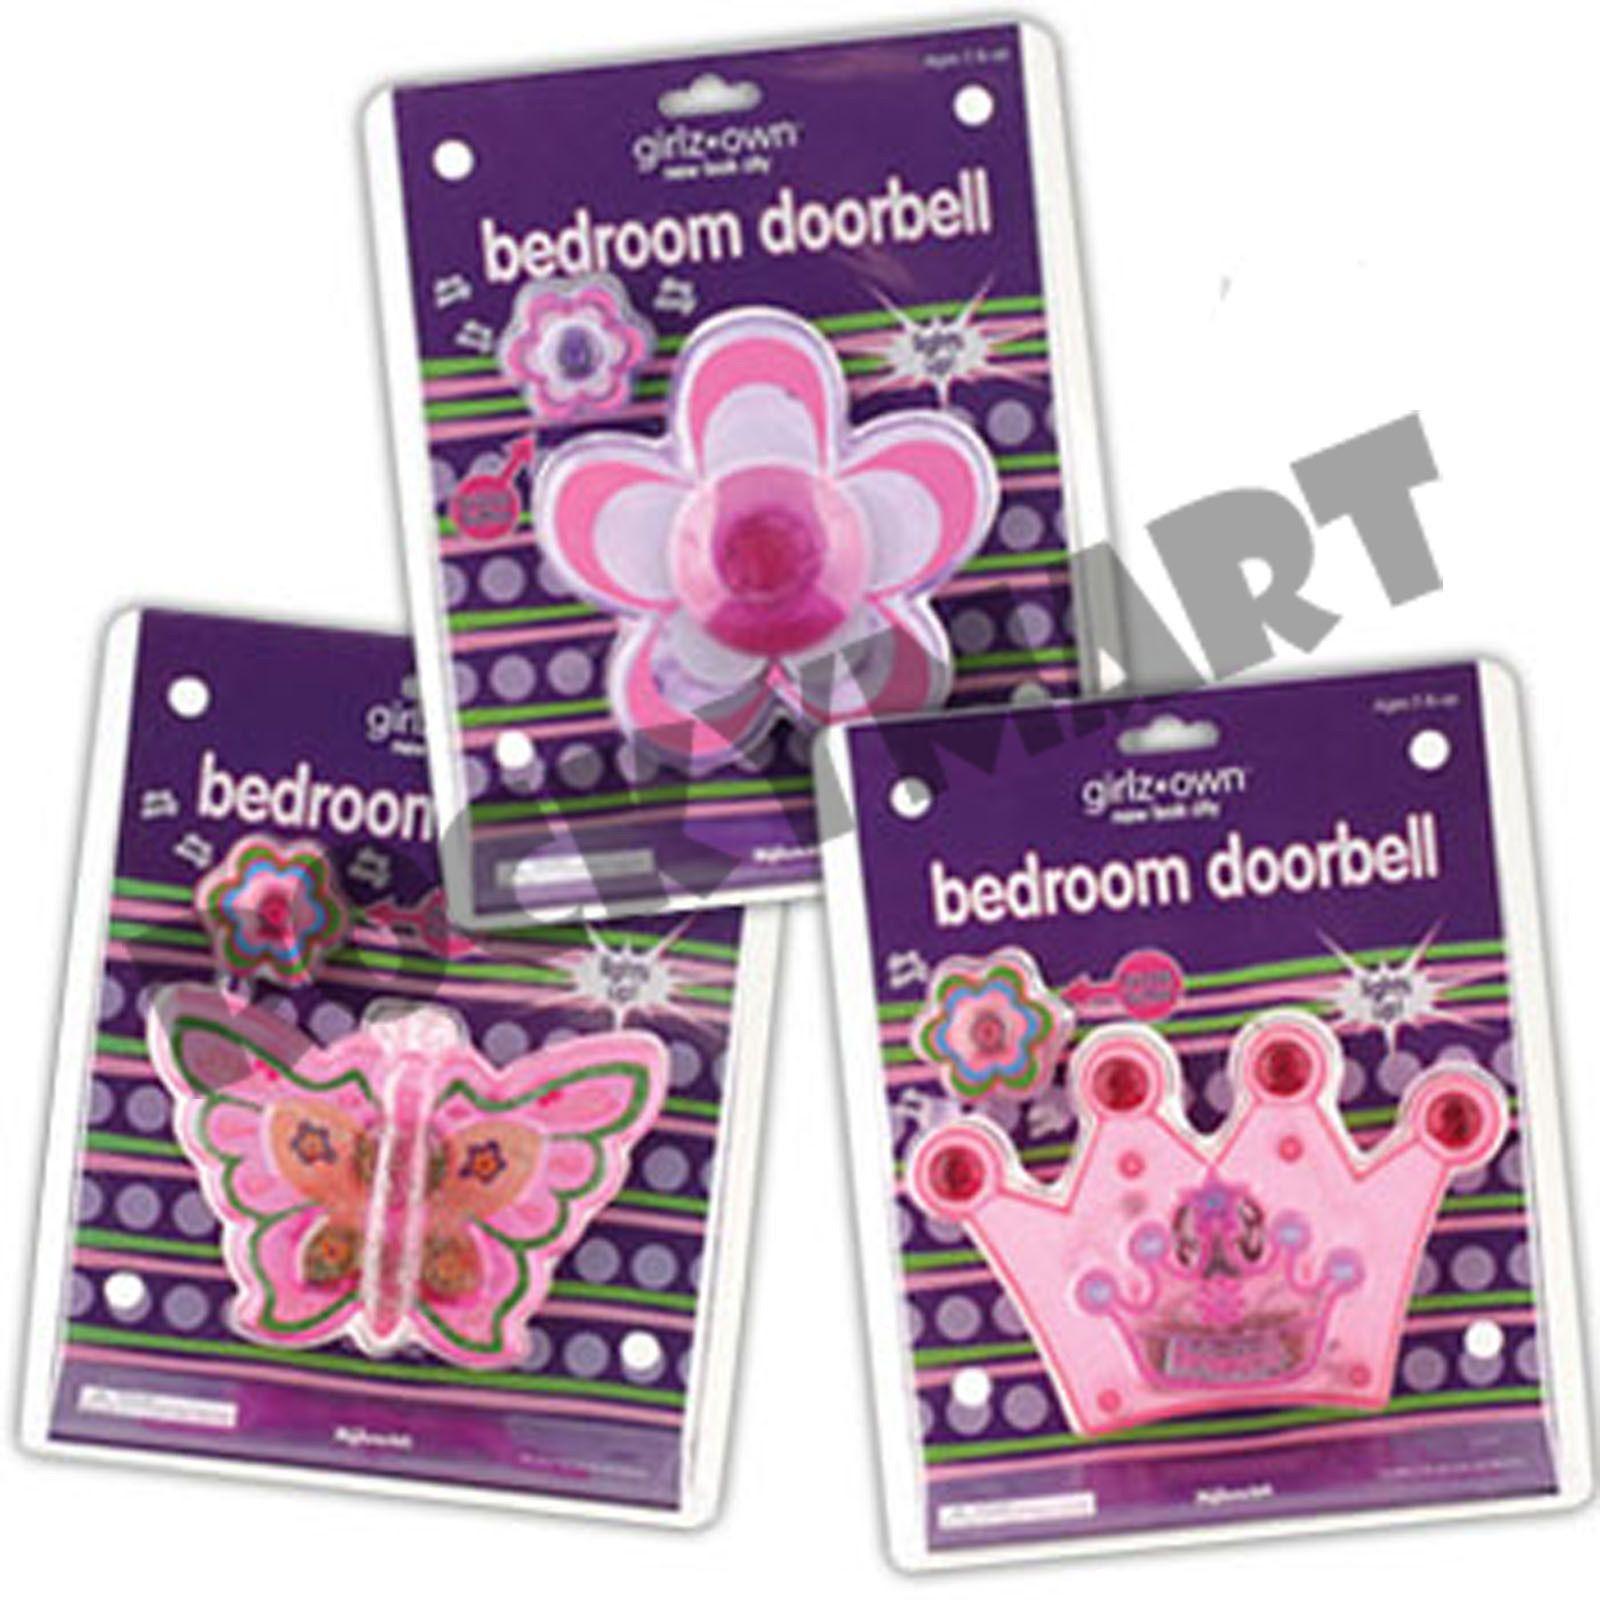 Girls Own Bedroom Doorbell 3 Designs Butterfly Daisy Princess